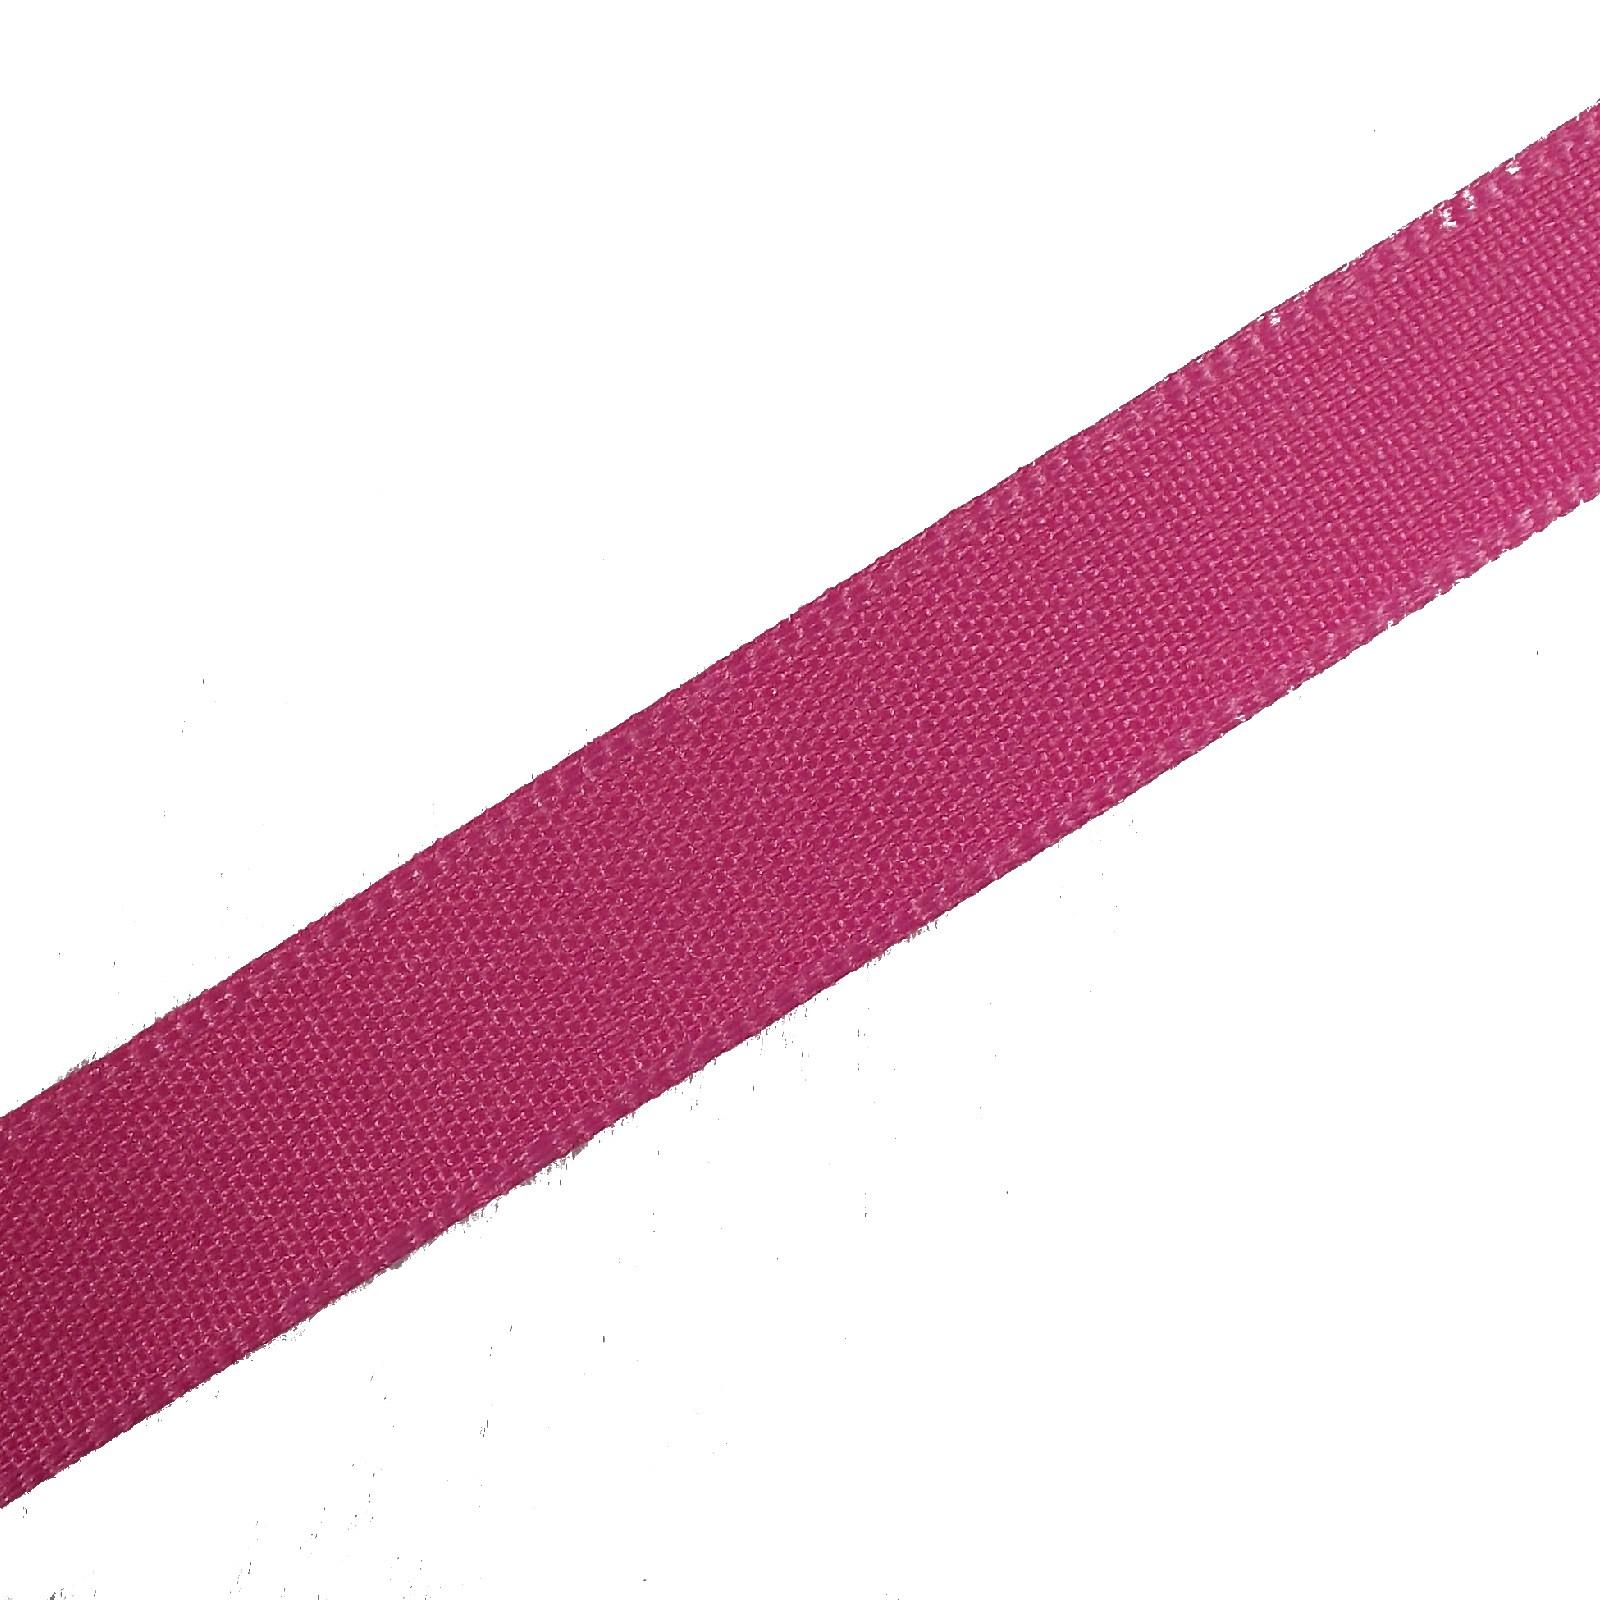 Berisfords Seam Binding Polyester Ribbon Tape 25mm wide Hot Pink 1 metre length